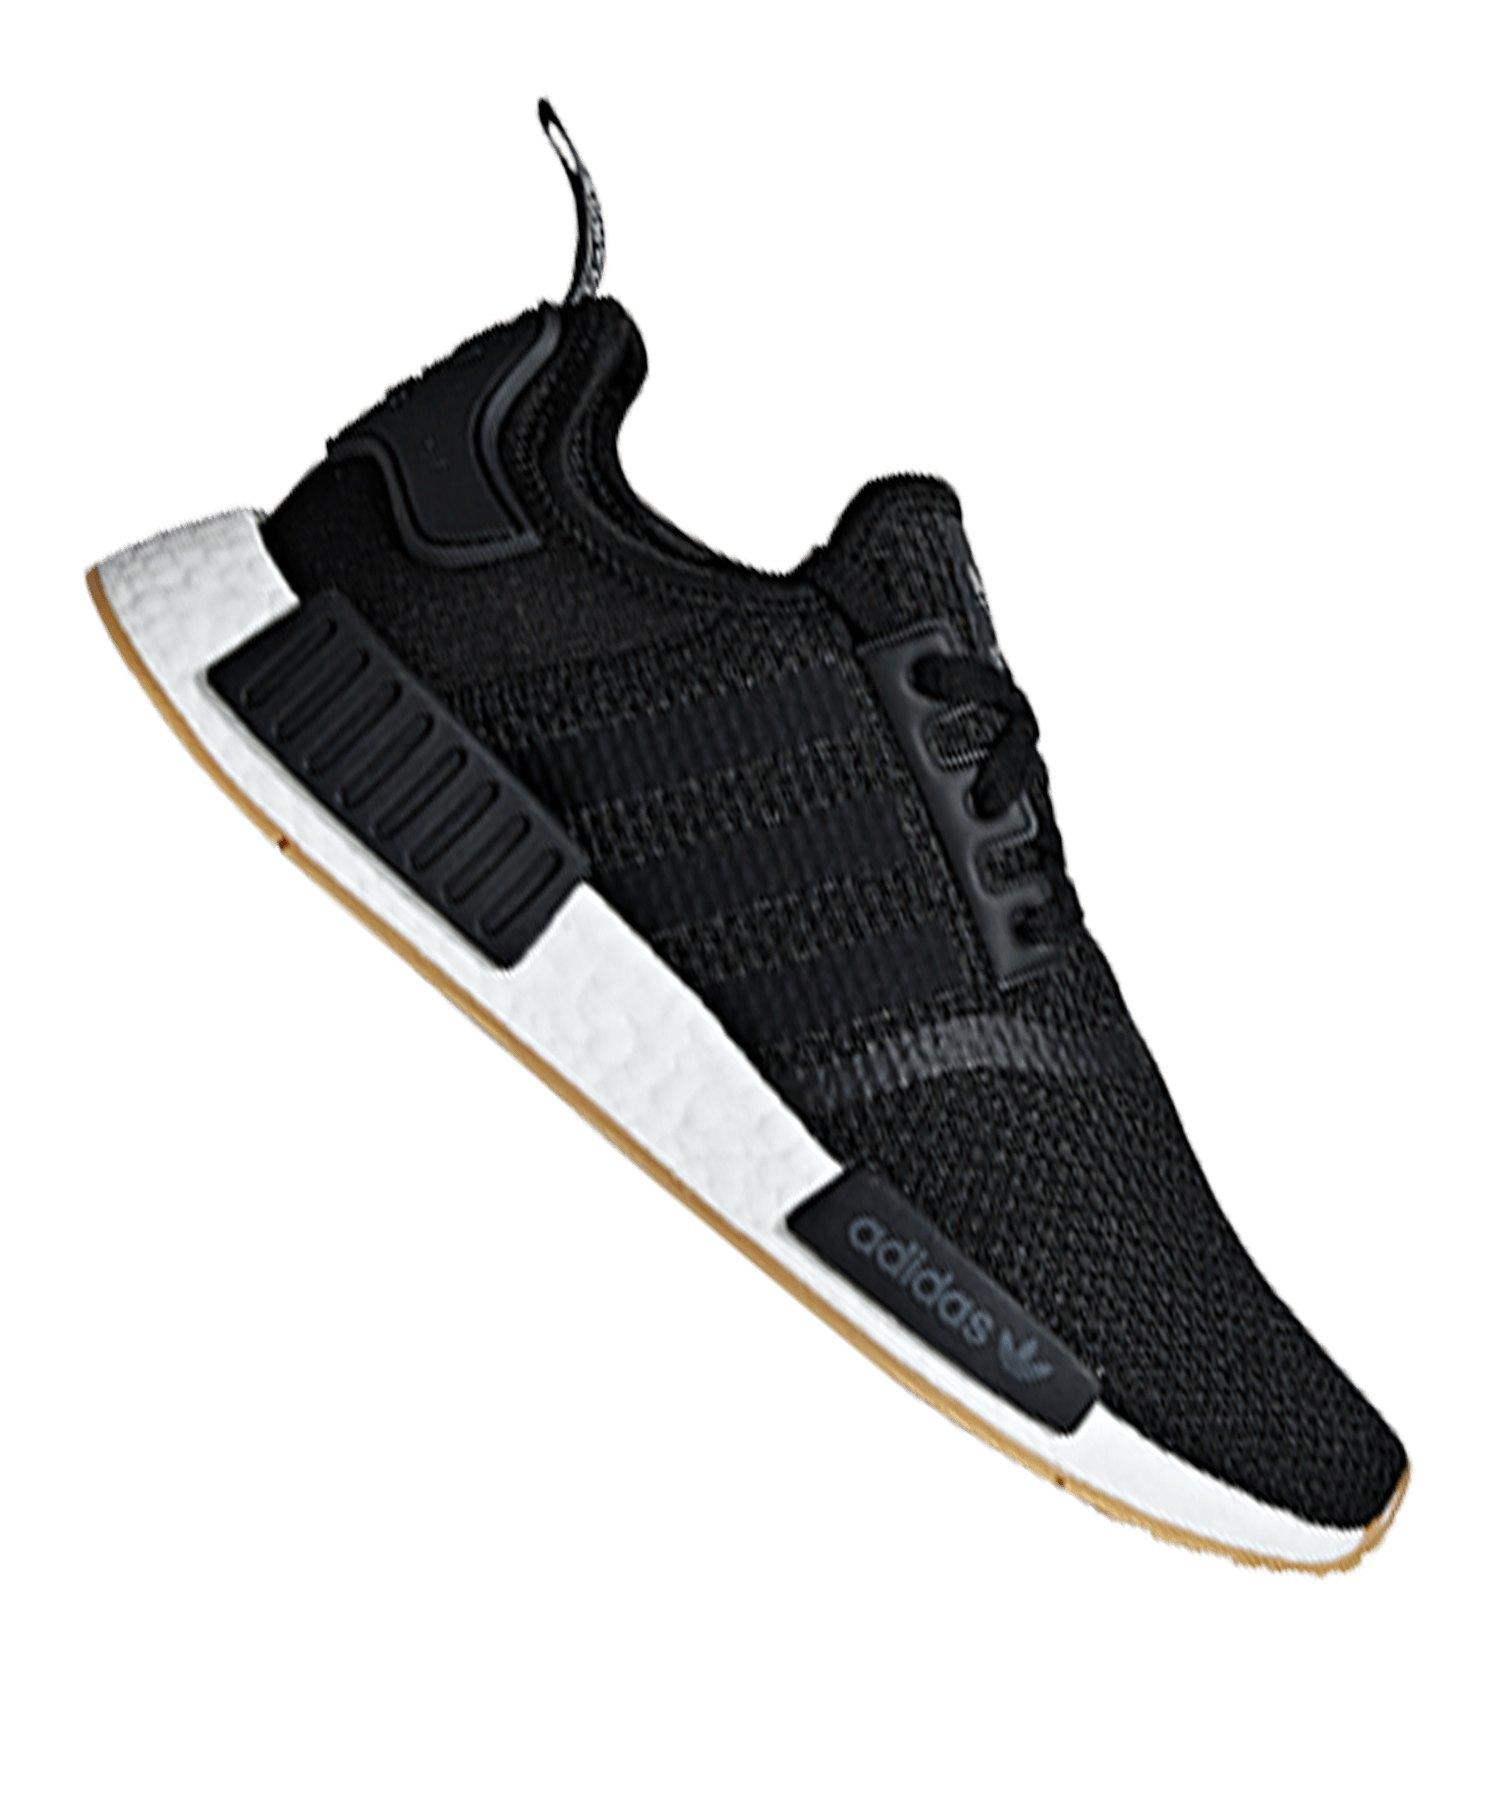 adidas NMD R1 Schuhe schwarz